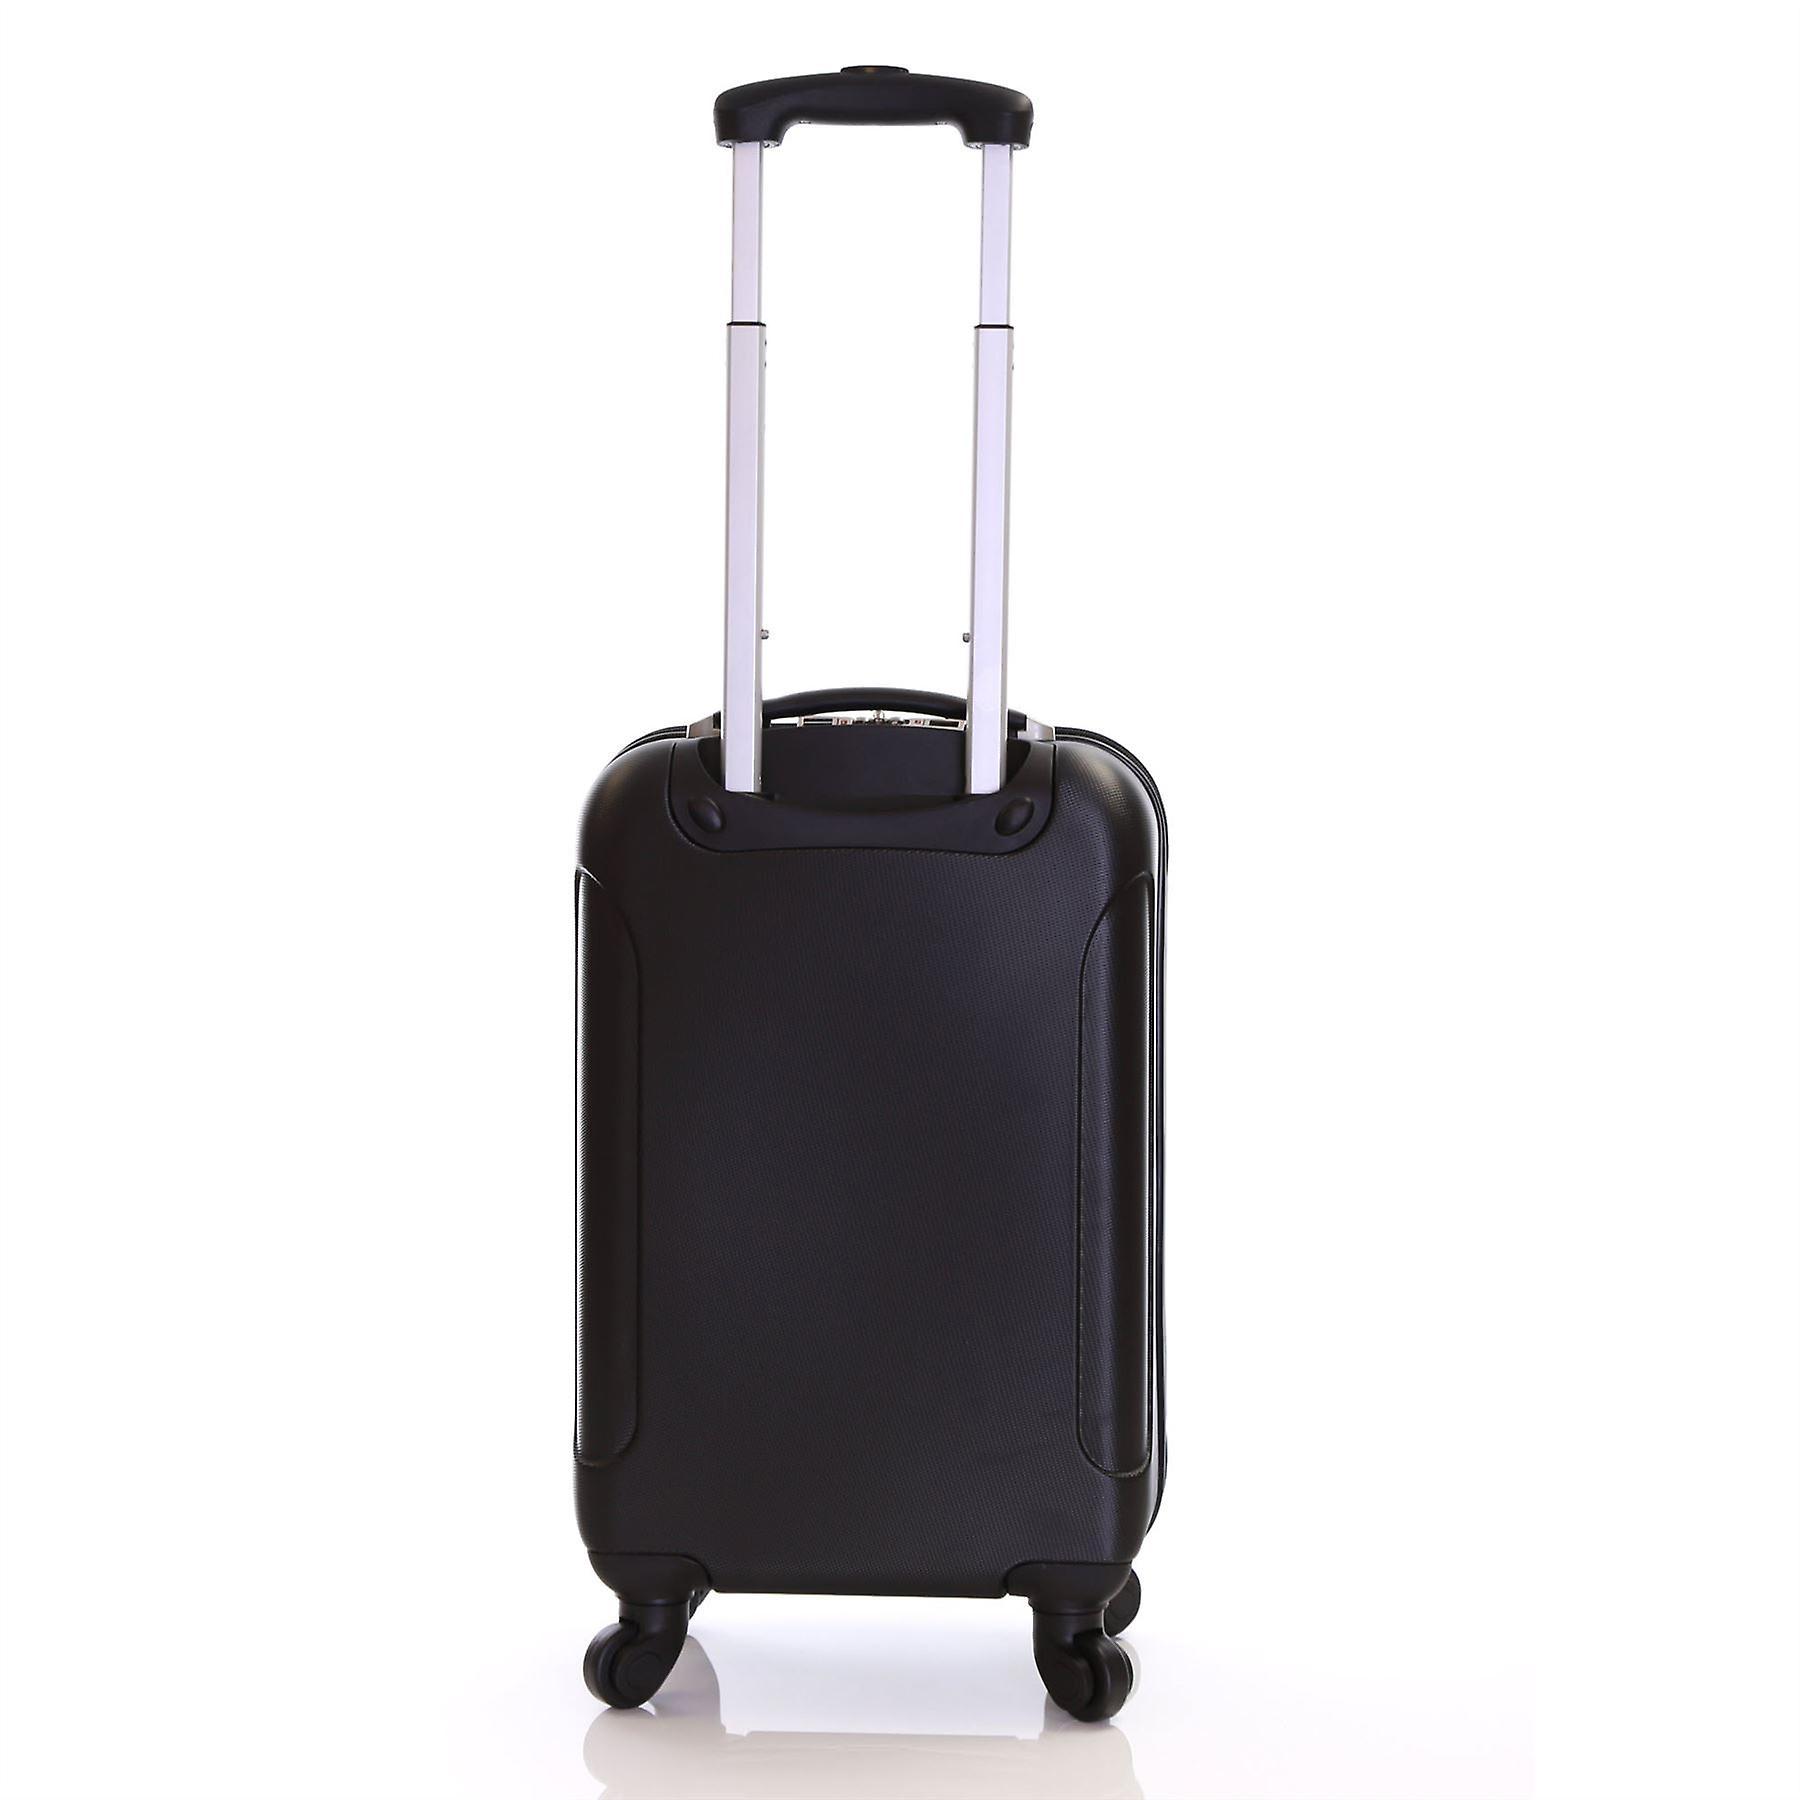 Karabar Evora 55 cm Hard Suitcase, Obsidian Black